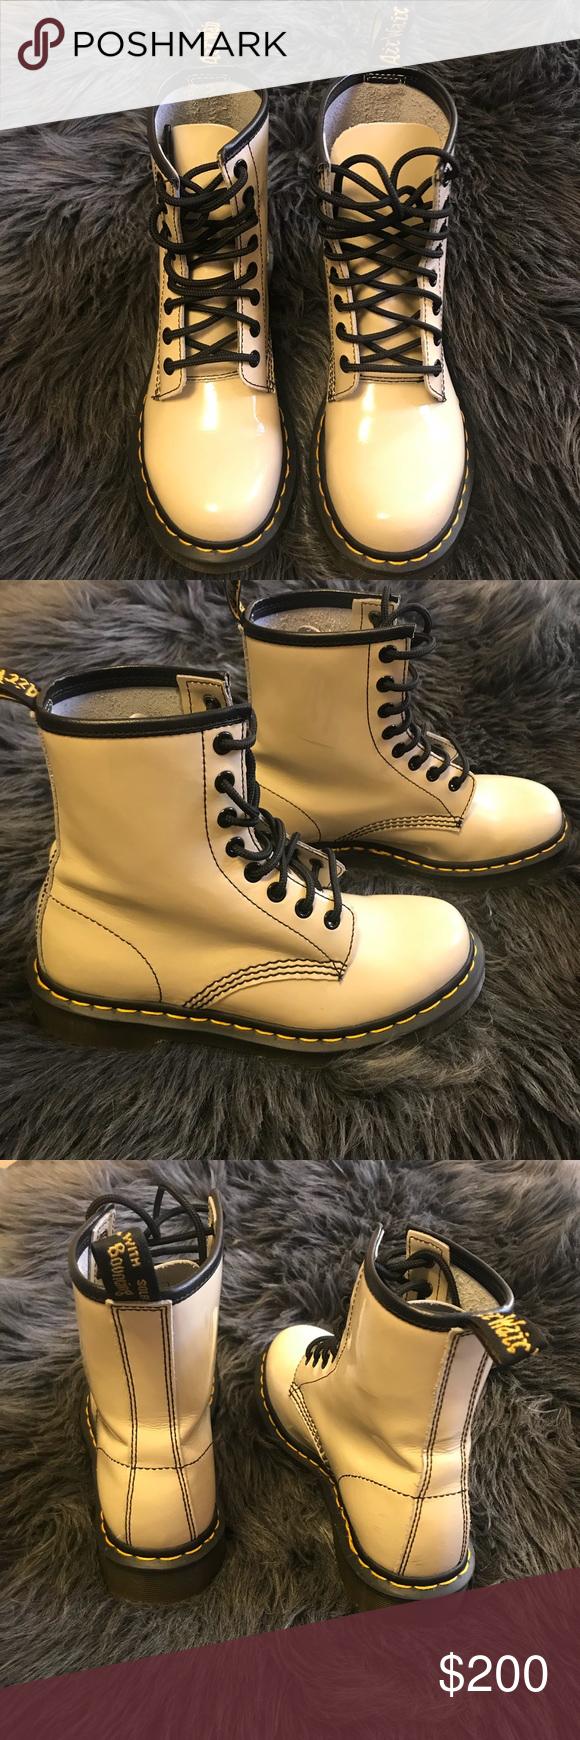 1311bed71c18 Dr martens boots size 6 - docs doc martens Doc martens size 6 boots  barely